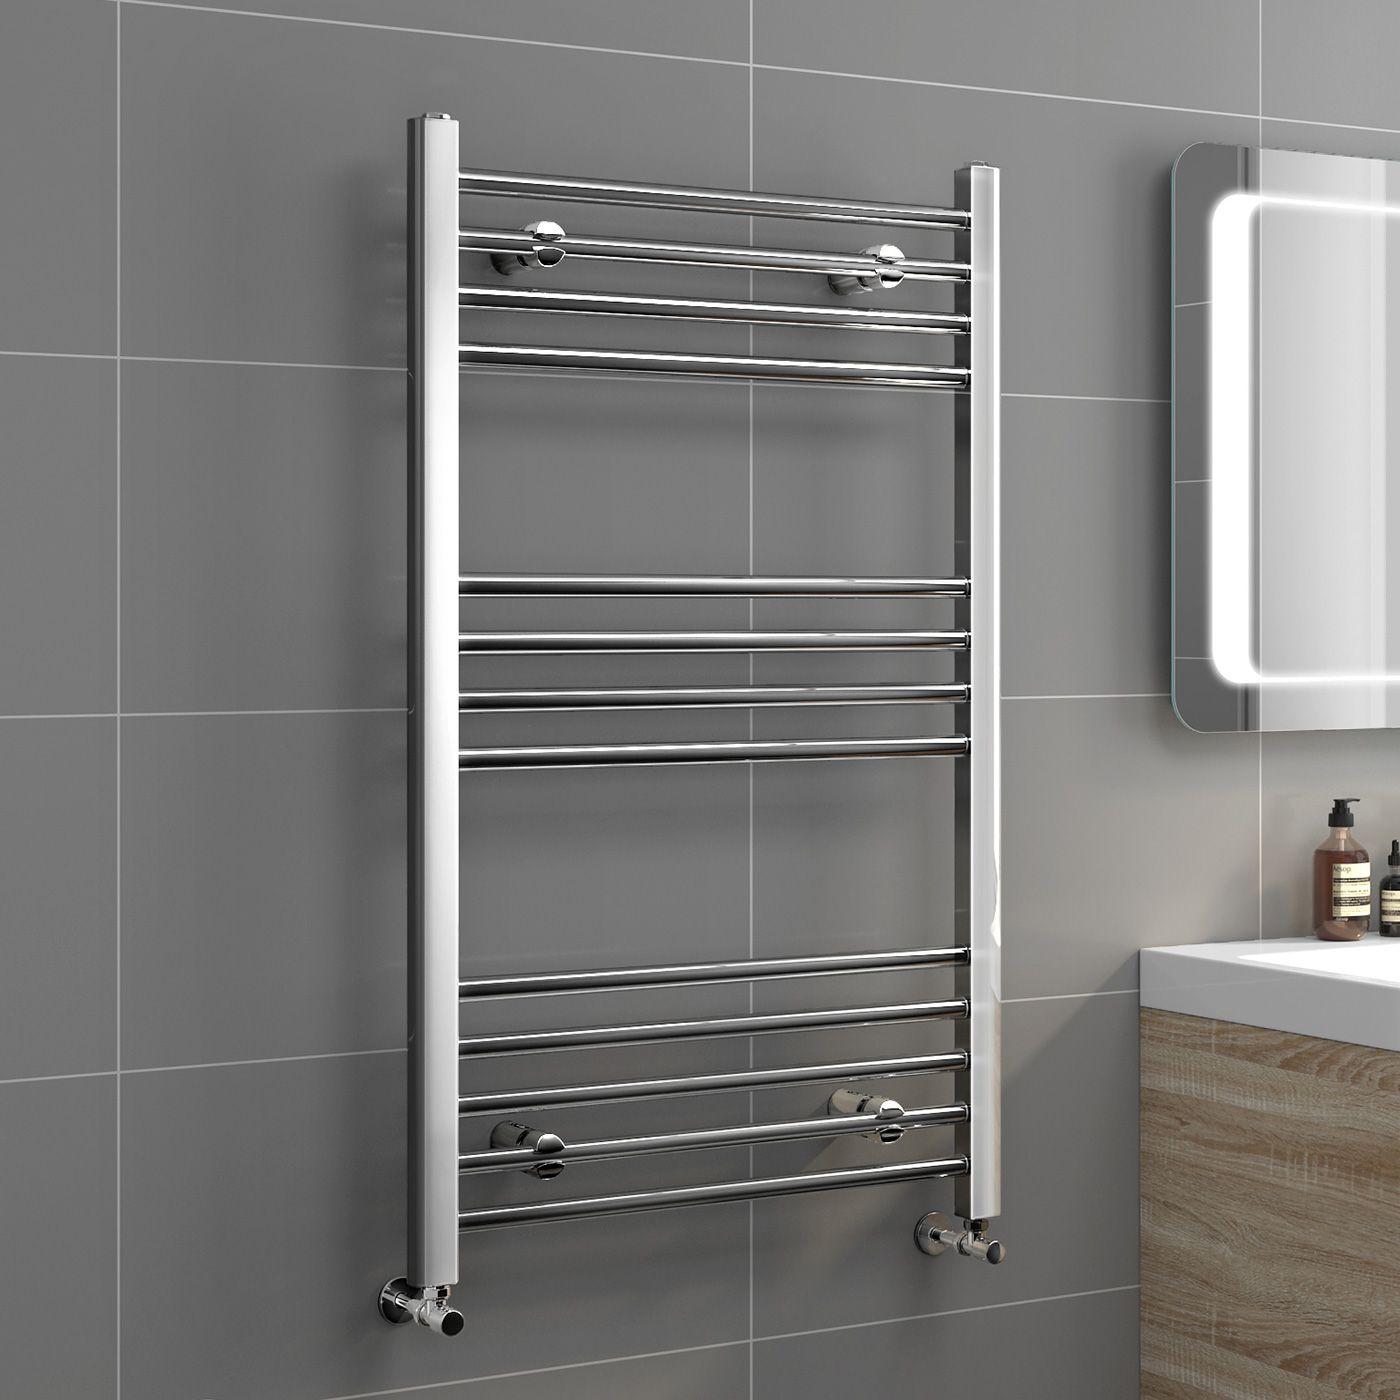 Natasha ladder rail straight modern electric towel radiator in chrome - 1000x600mm 20mm Tubes Chrome Heated Straight Rail Ladder Towel Radiator Natasha Basic